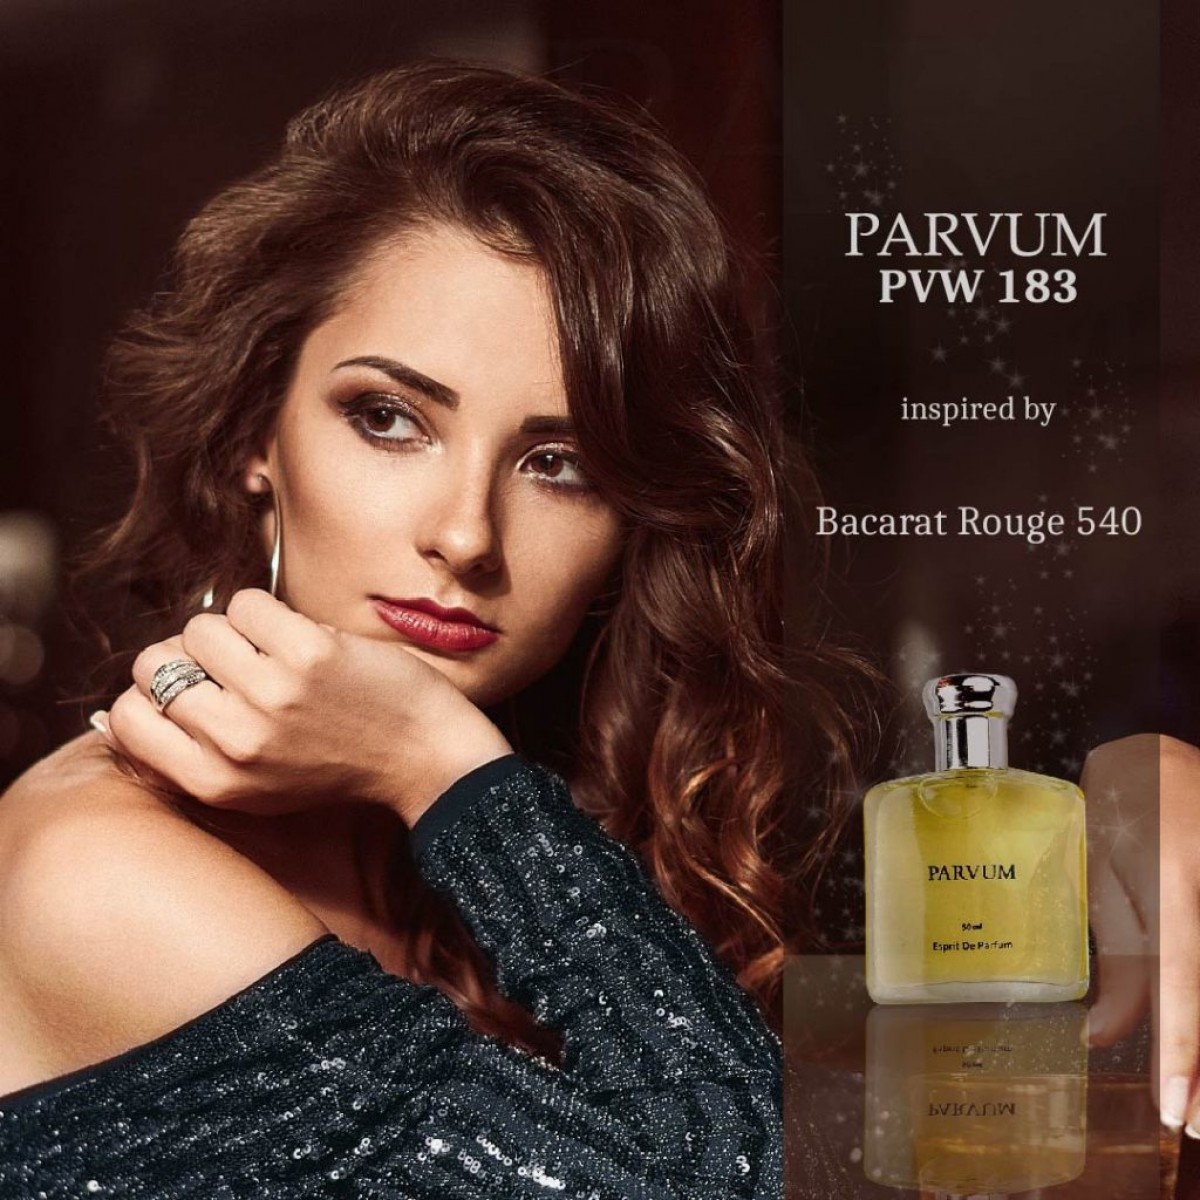 PARVUM Inspired By Bacarat Roungge 540 - Hara & Co